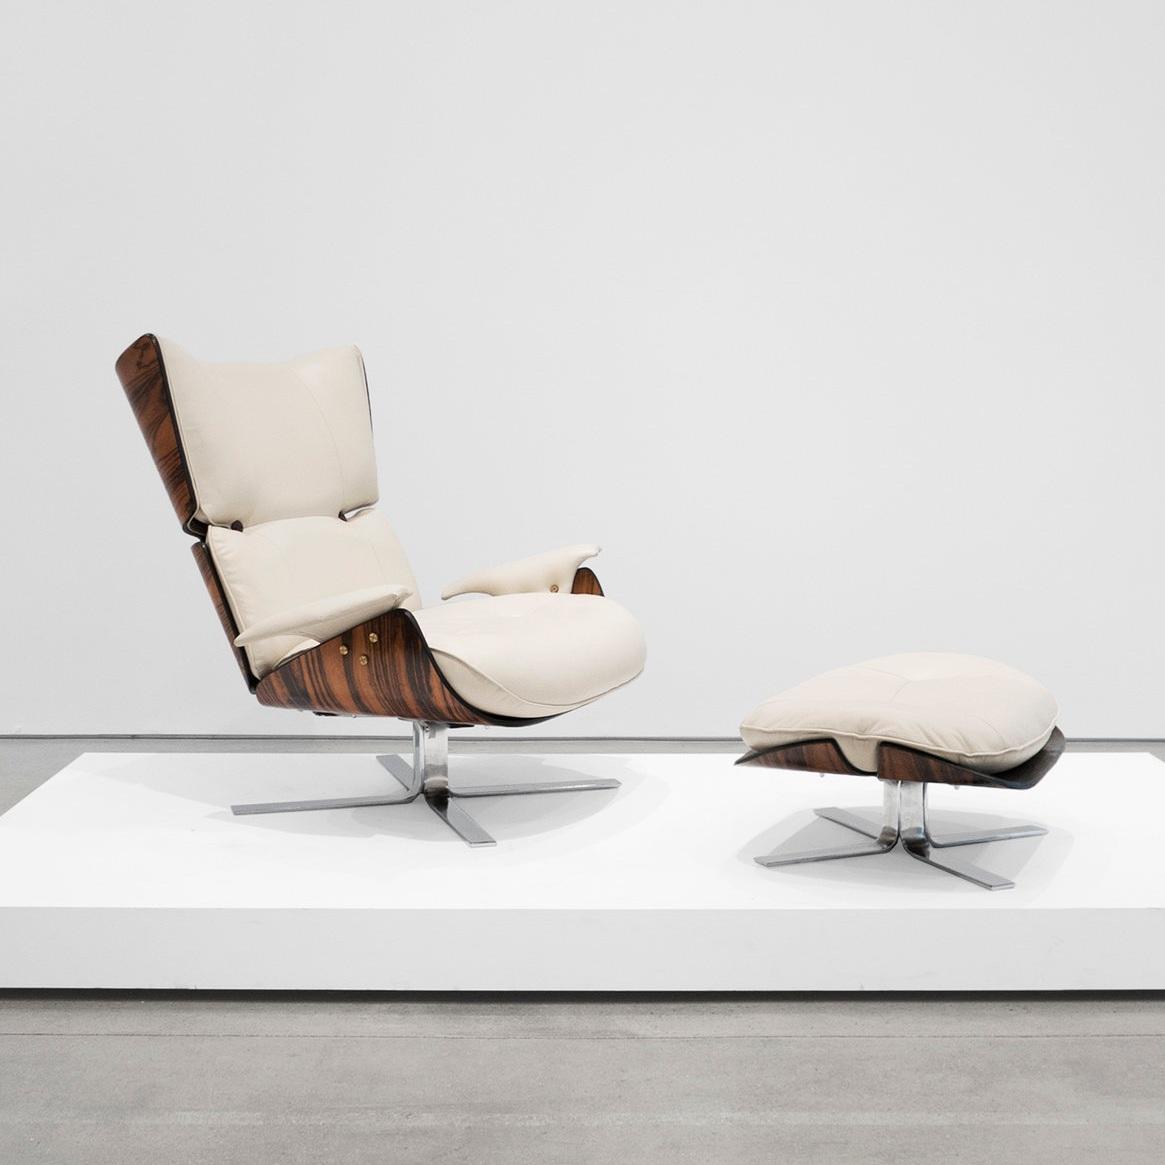 jorge zalszupin paulistana lounge chair & ottoman $32,000